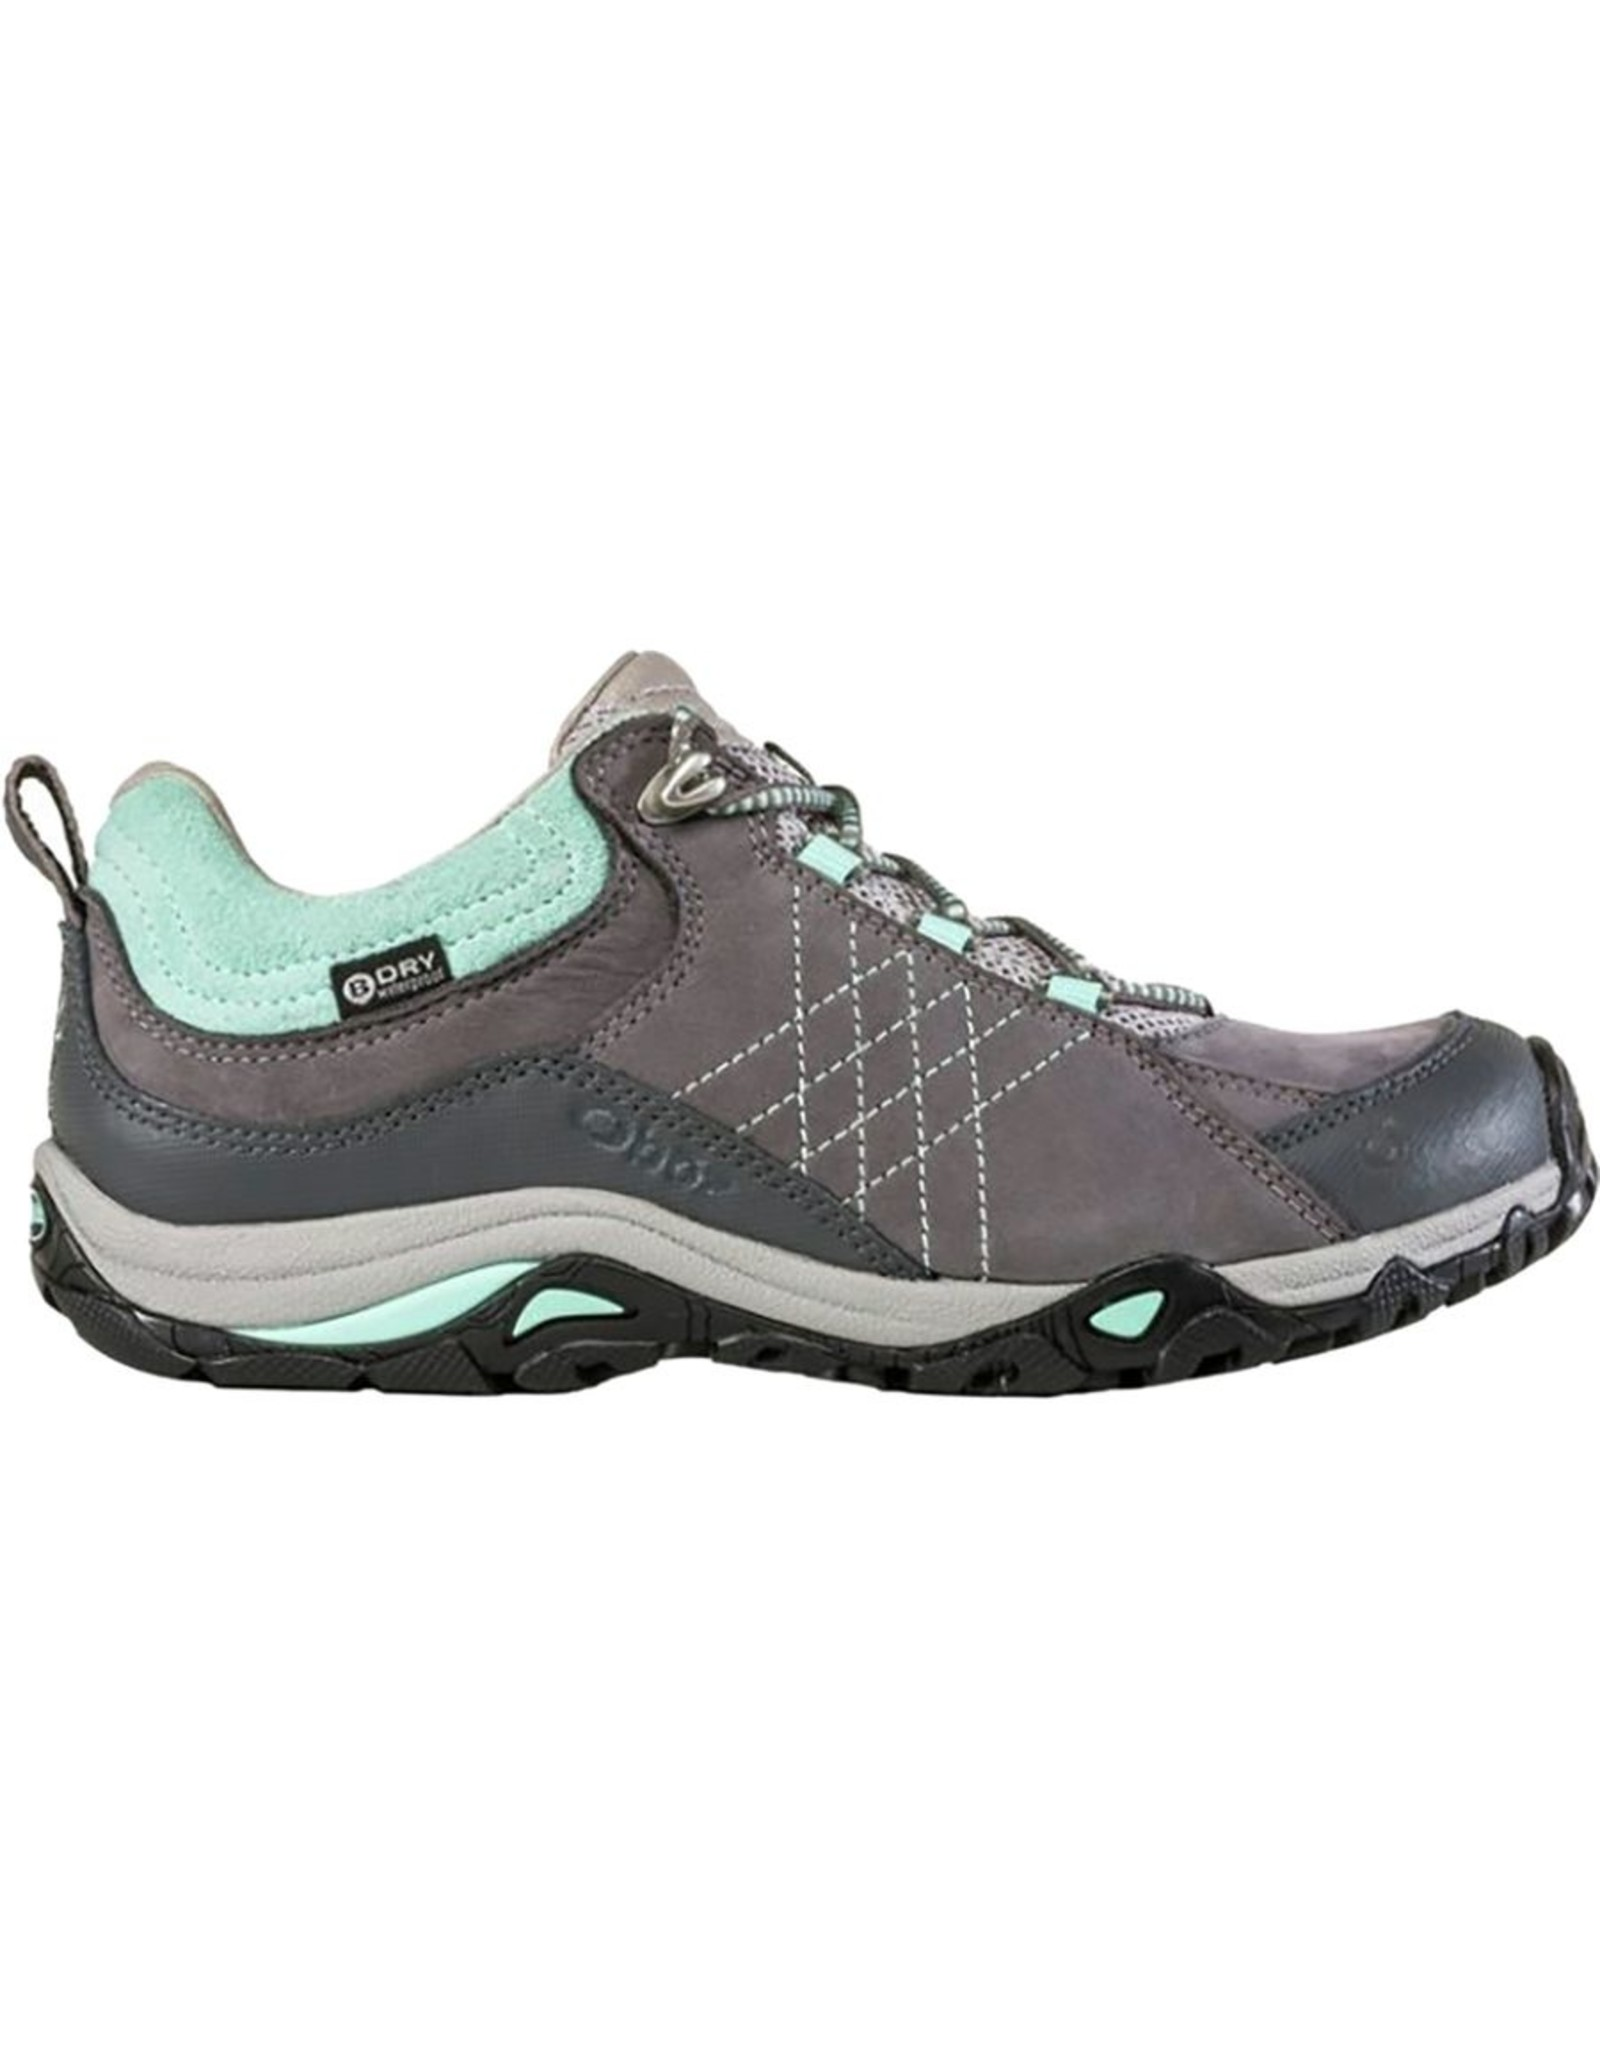 Oboz Footwear Oboz Women's Sapphire Low B-Dry Waterproof Hiking Shoe Charcoal / Beach Glass 7